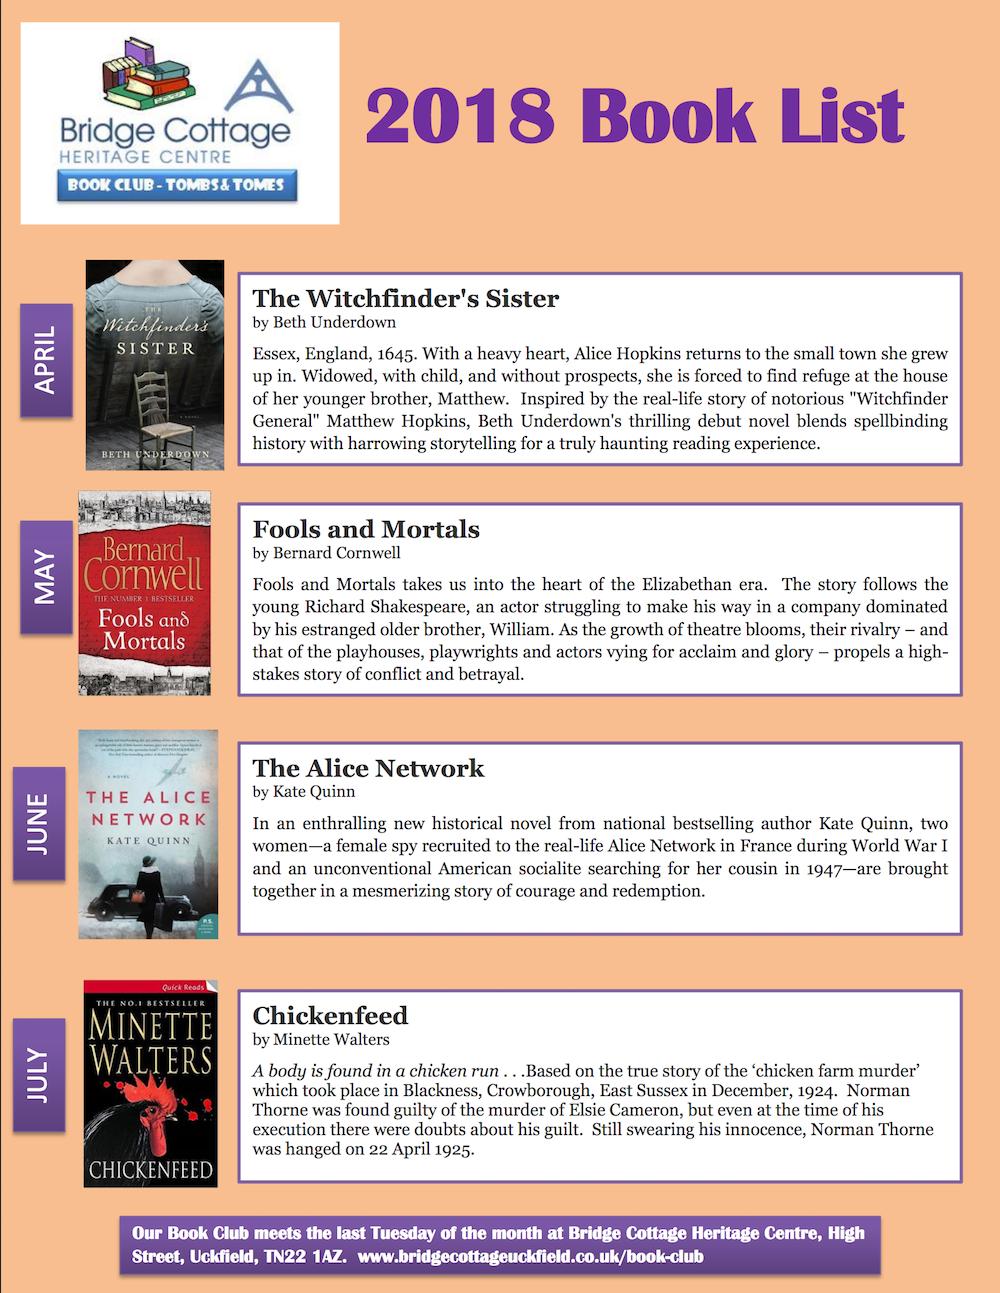 bridge-cottage-book-club-book-list